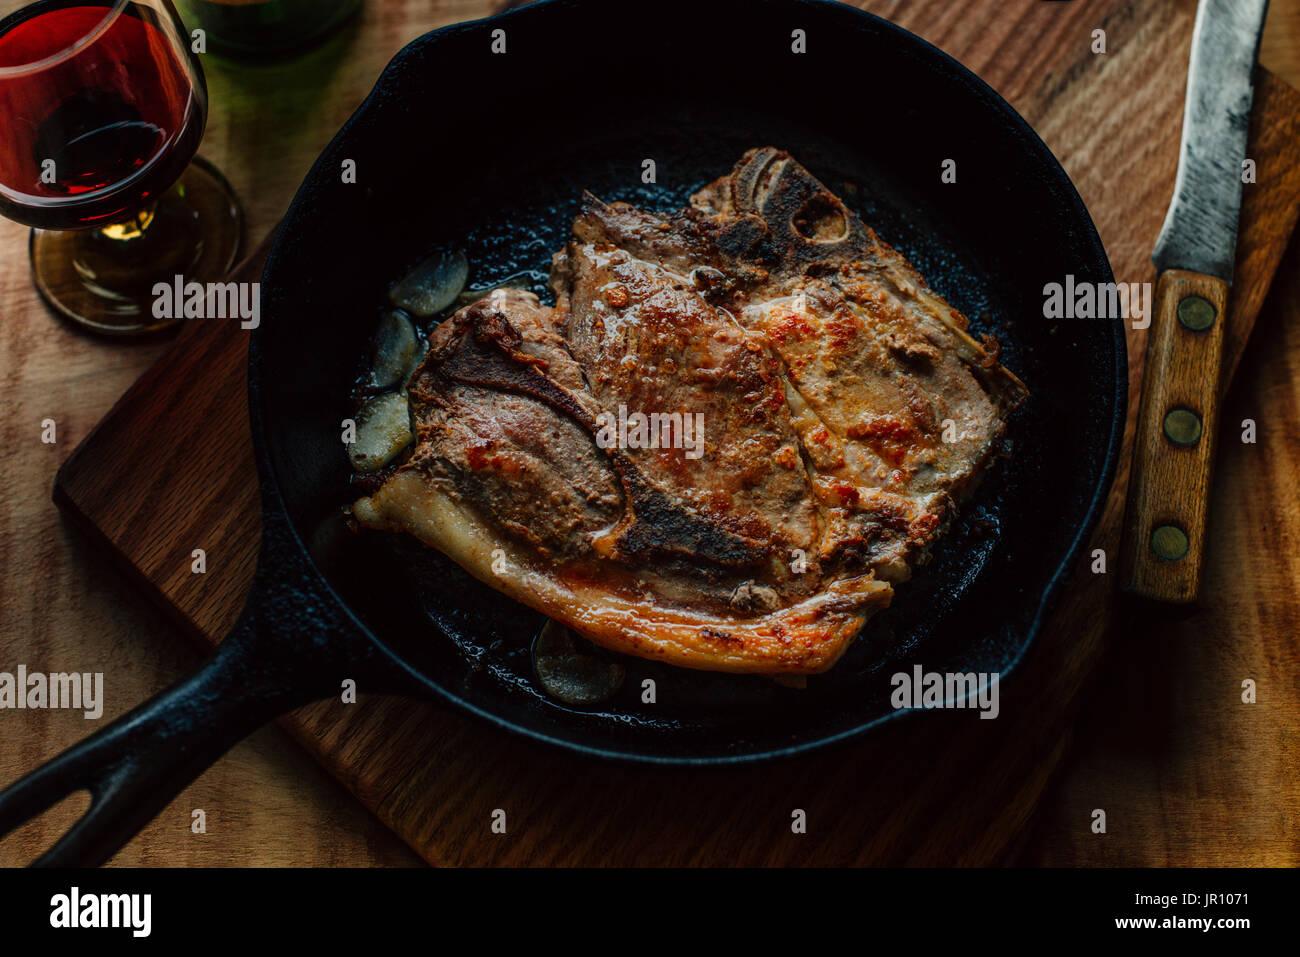 pork chop, country living, farm food - Stock Image